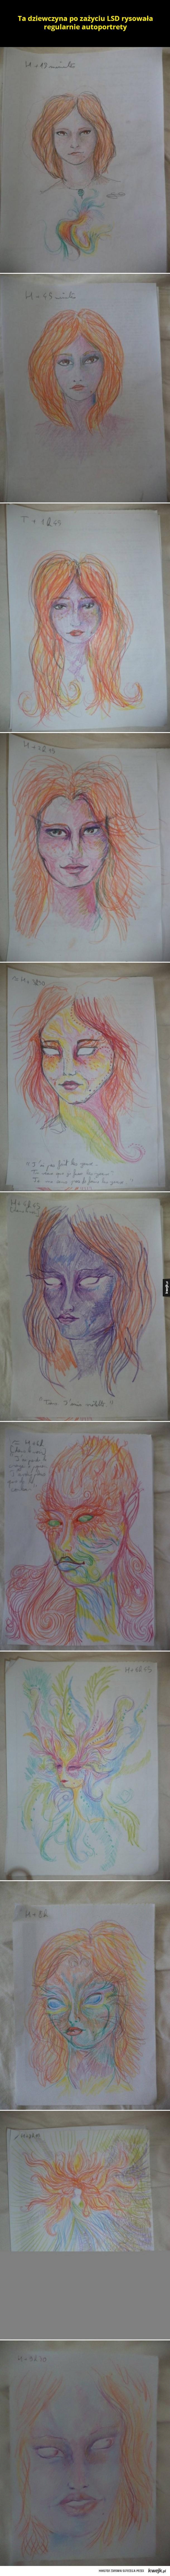 Autoportrety po LSD